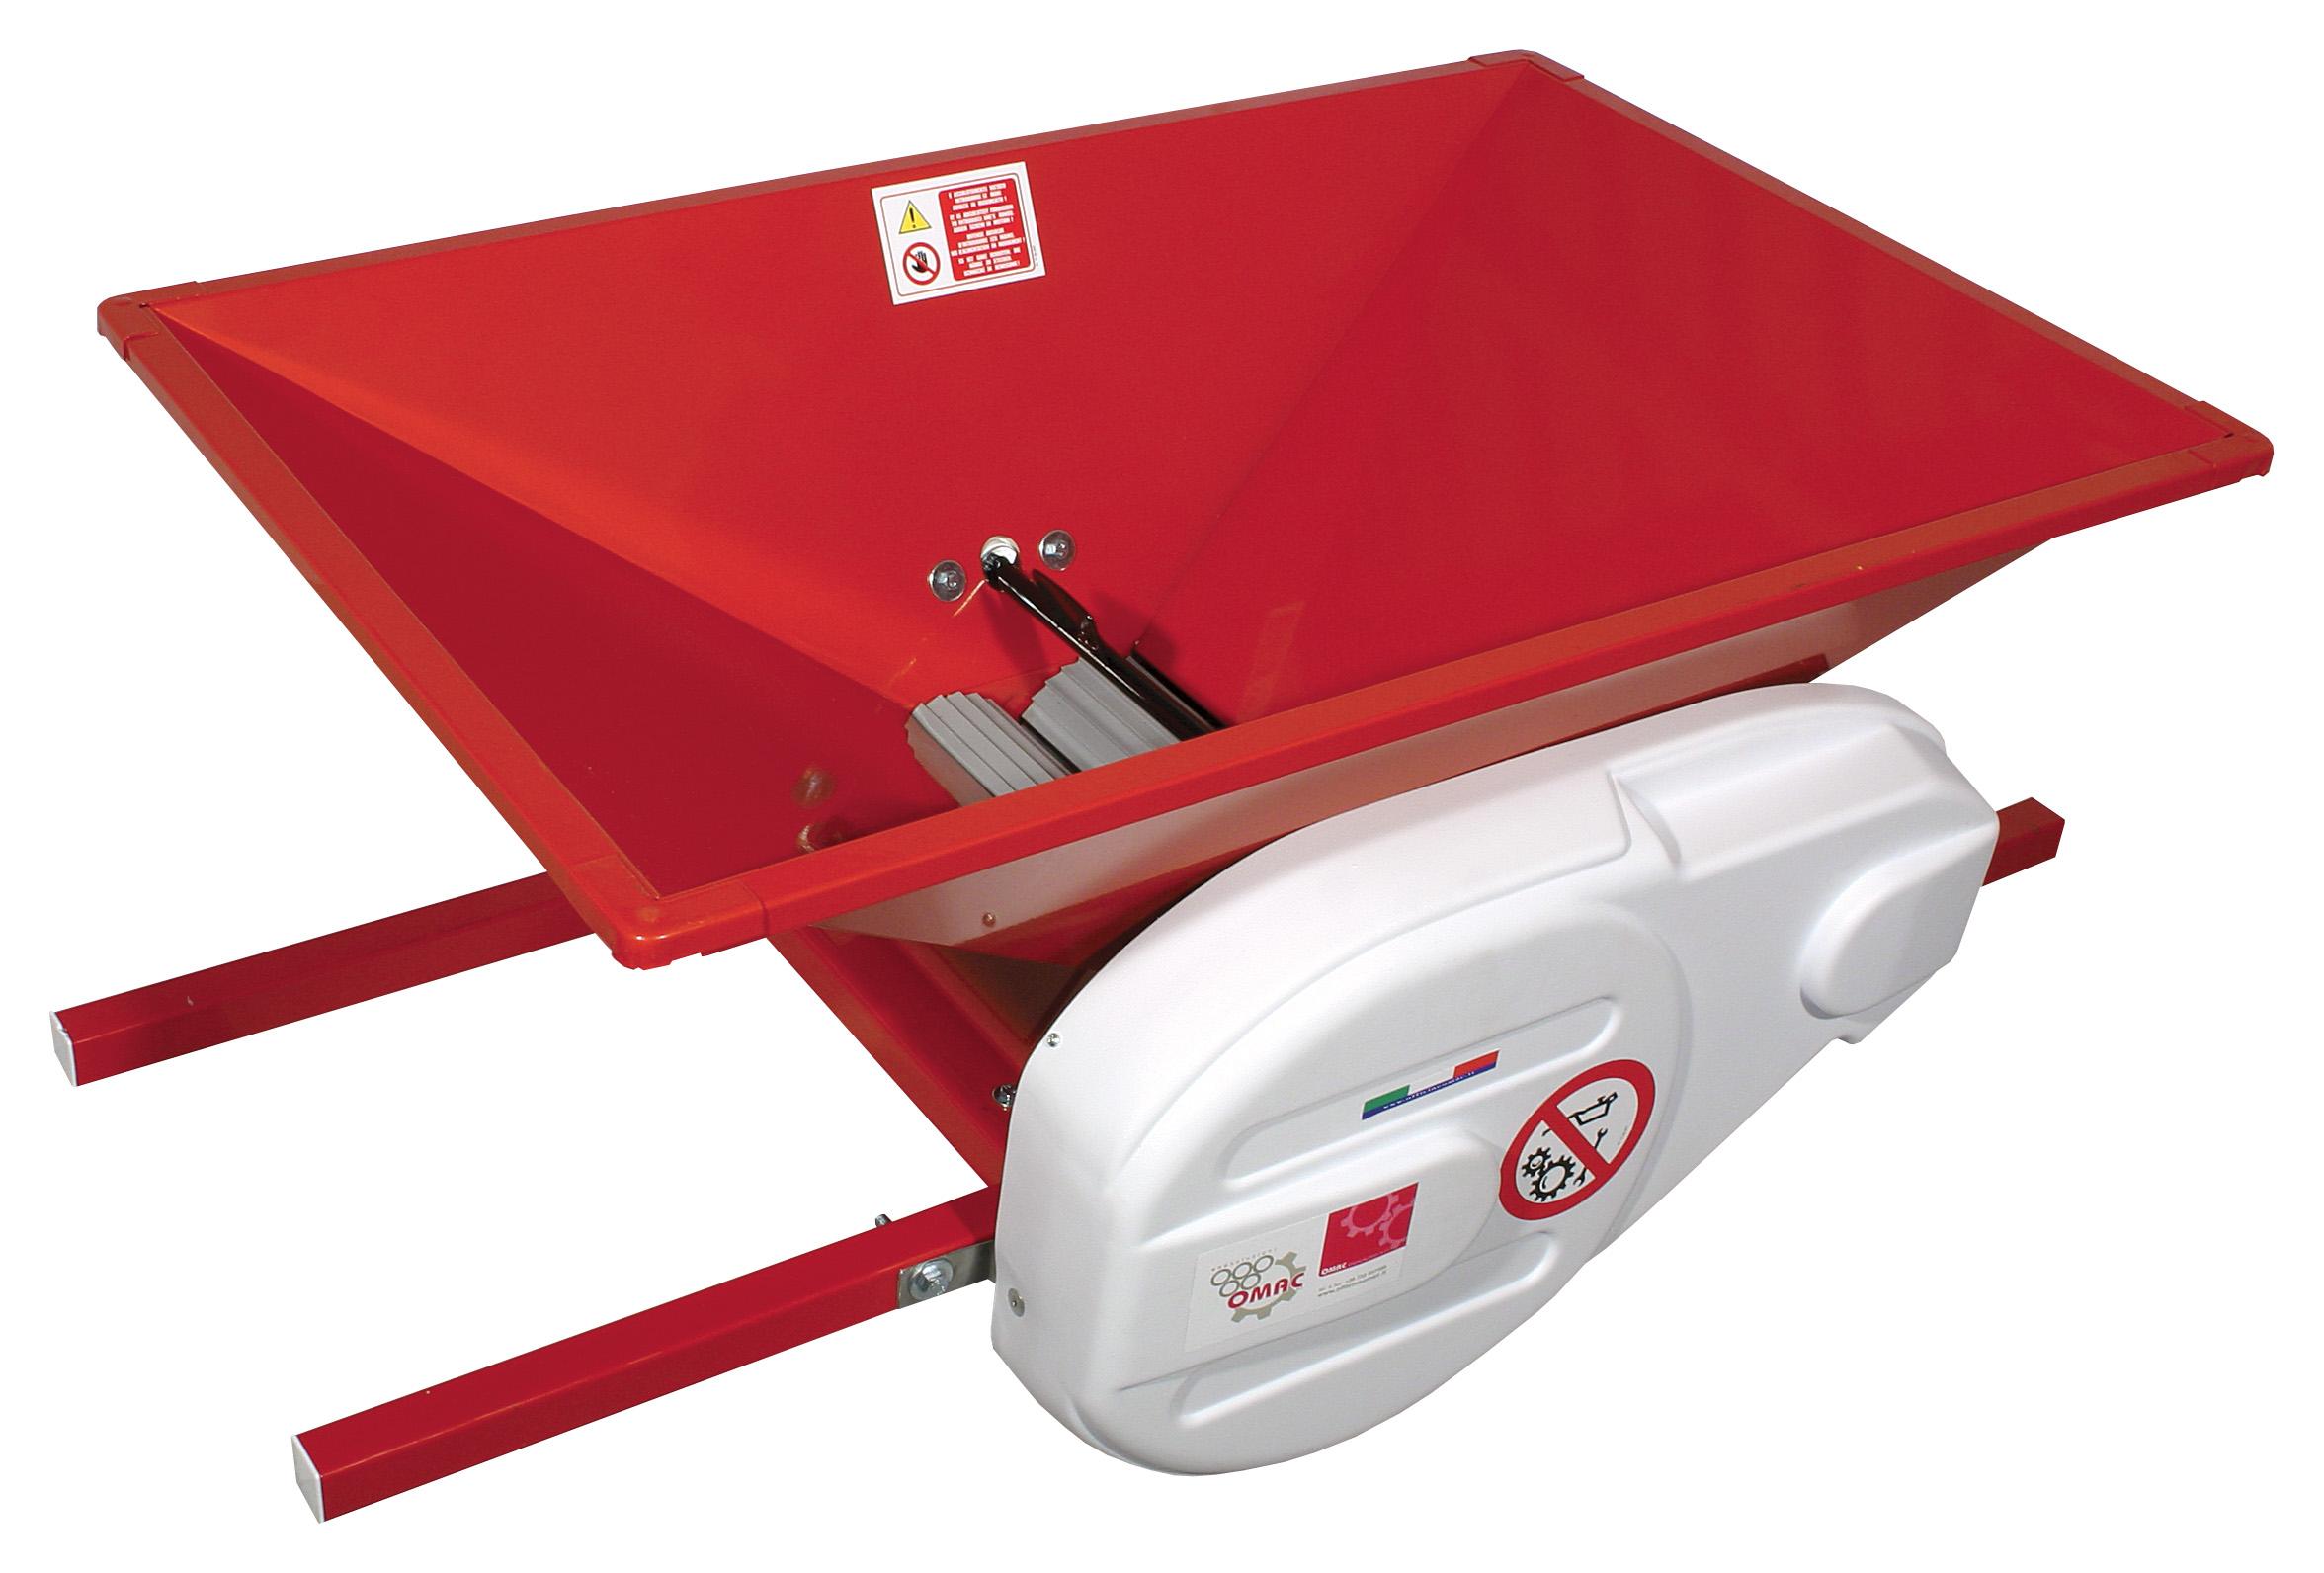 OMAC PGE - 142120 σπαστήρας σταφυλιών ηλεκτρικός 1,0 Hp